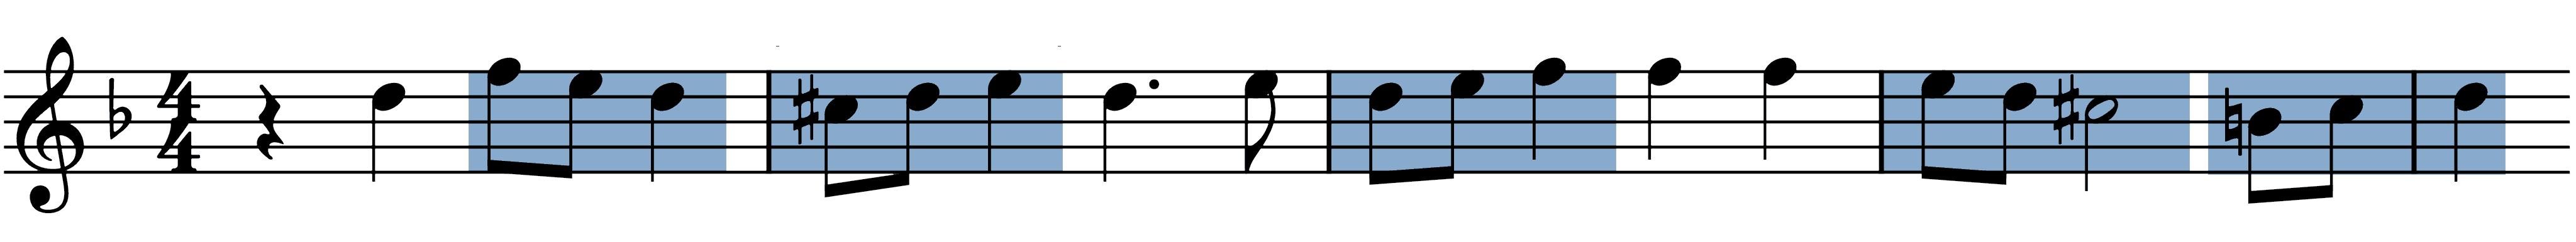 Rachmaninoff piano concerto melodic figures